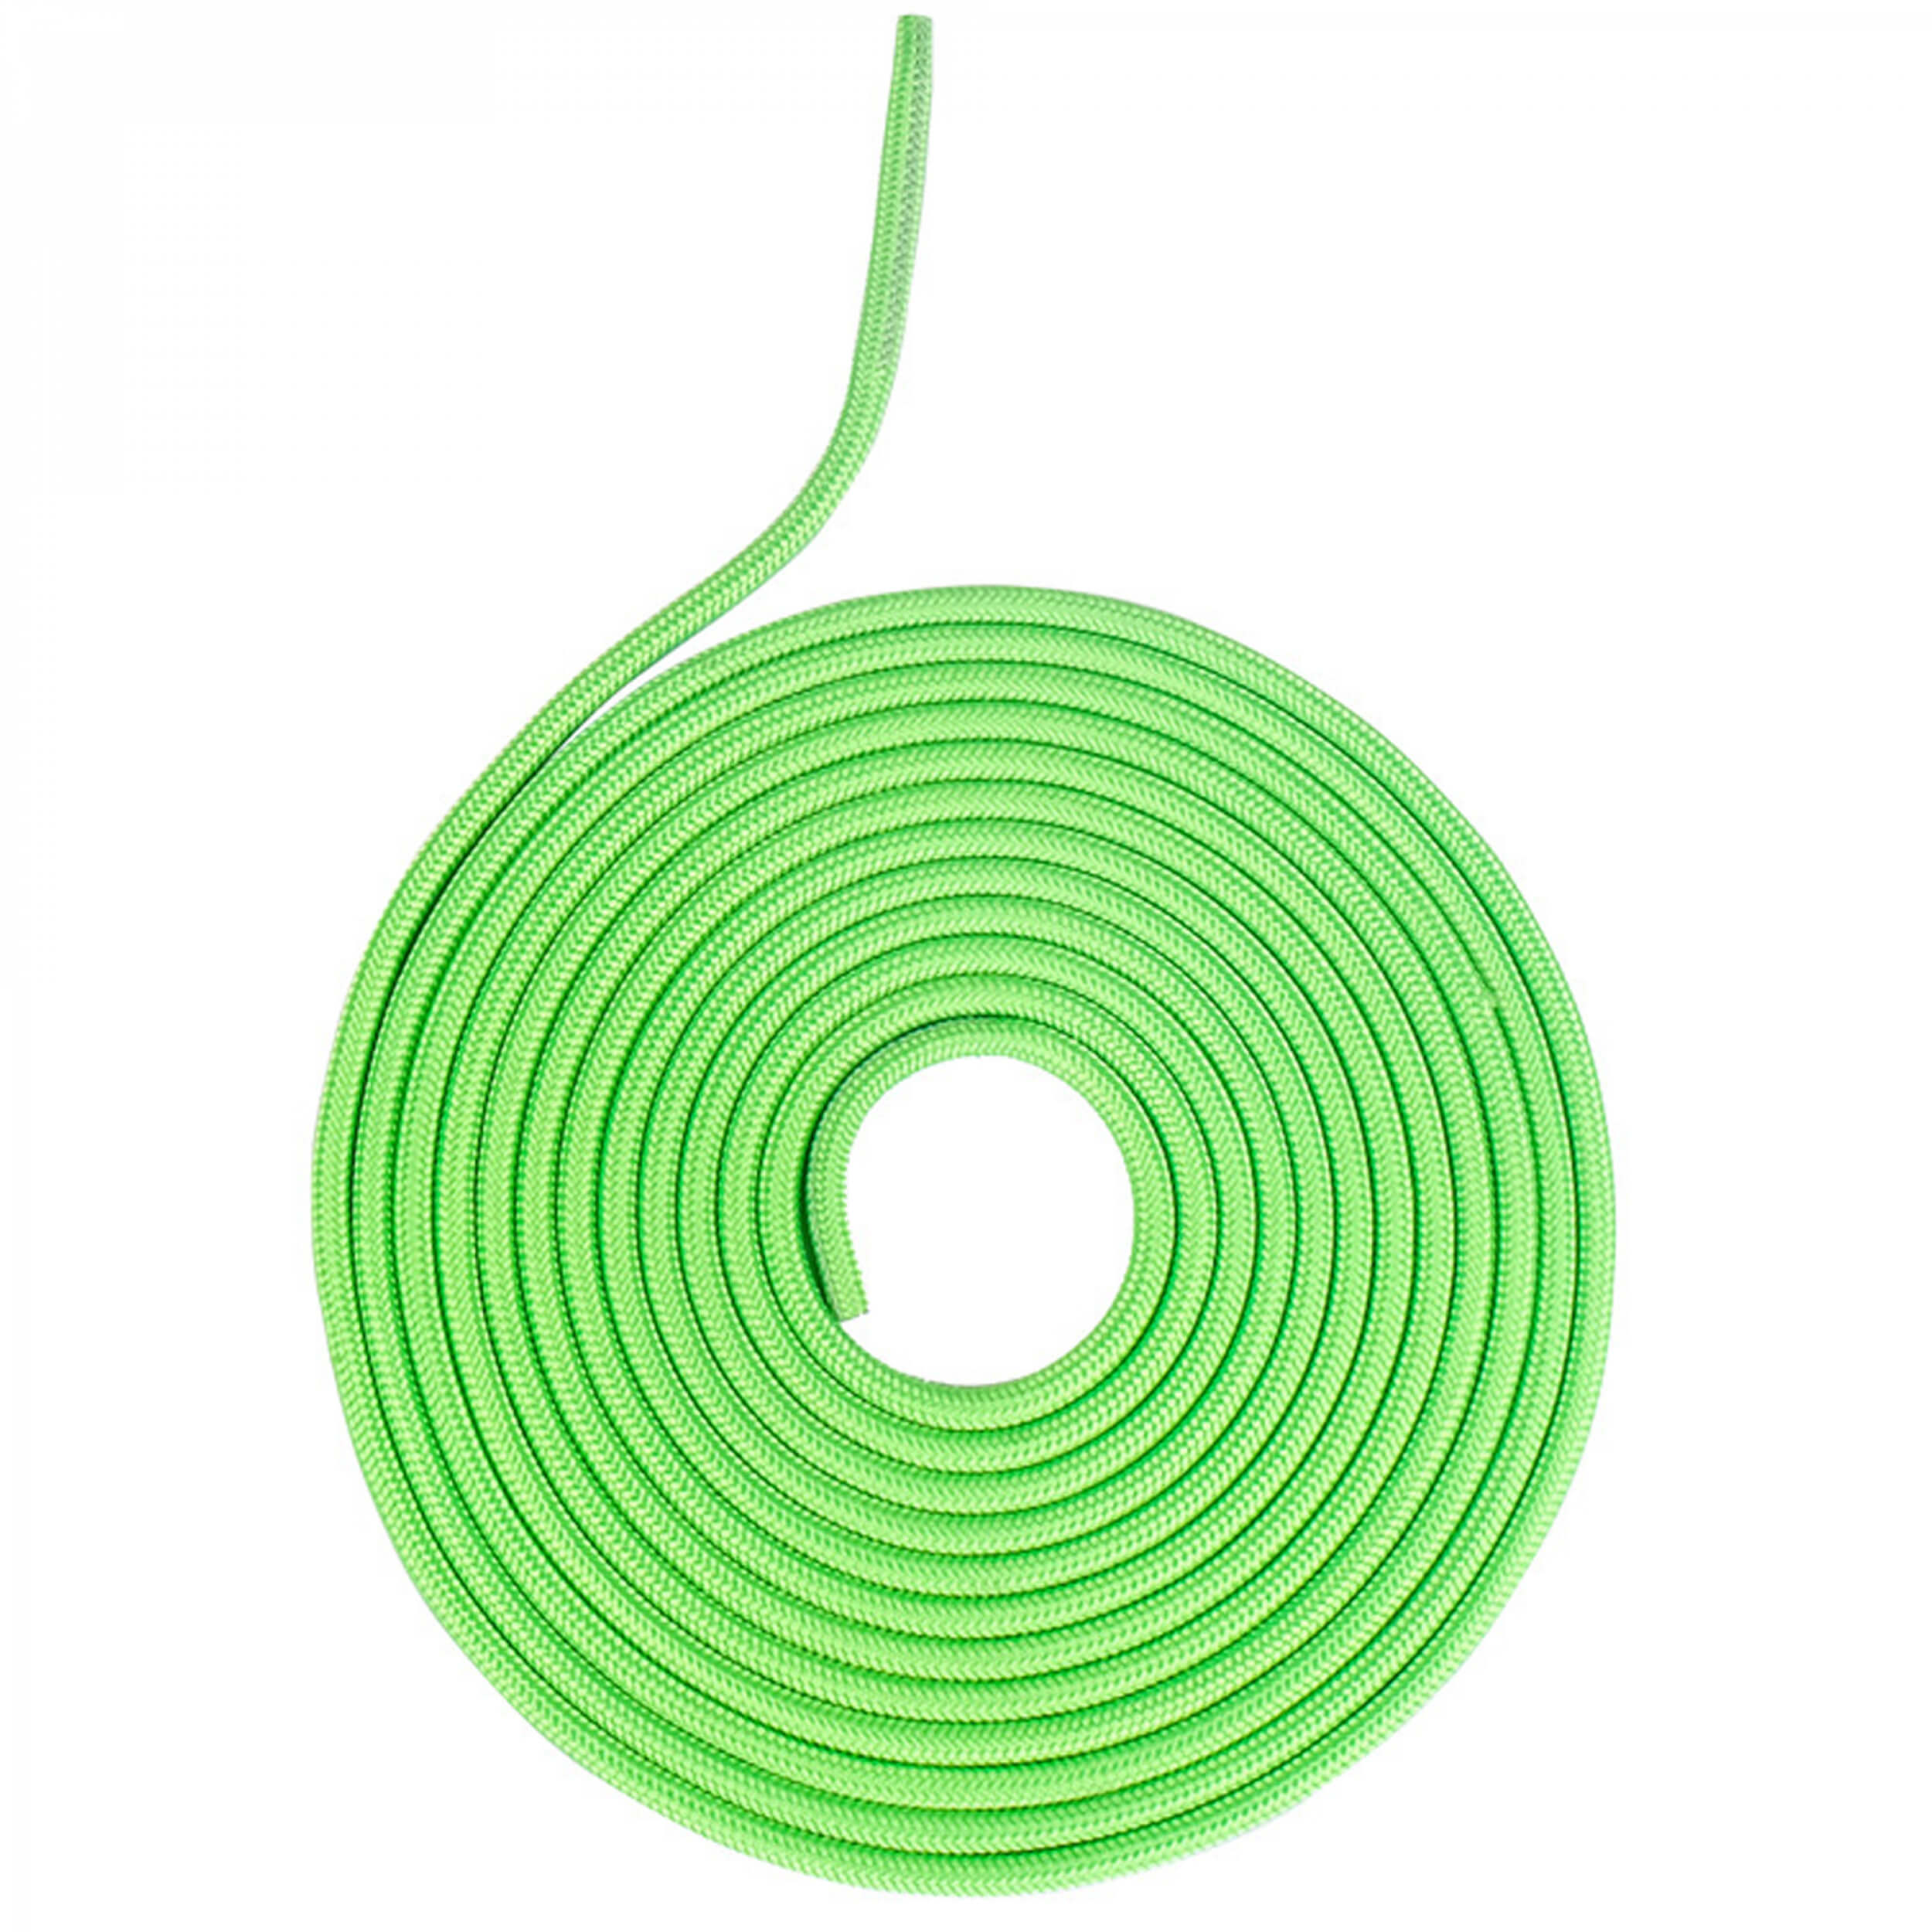 Edelrid Hard Line 6mm neon green